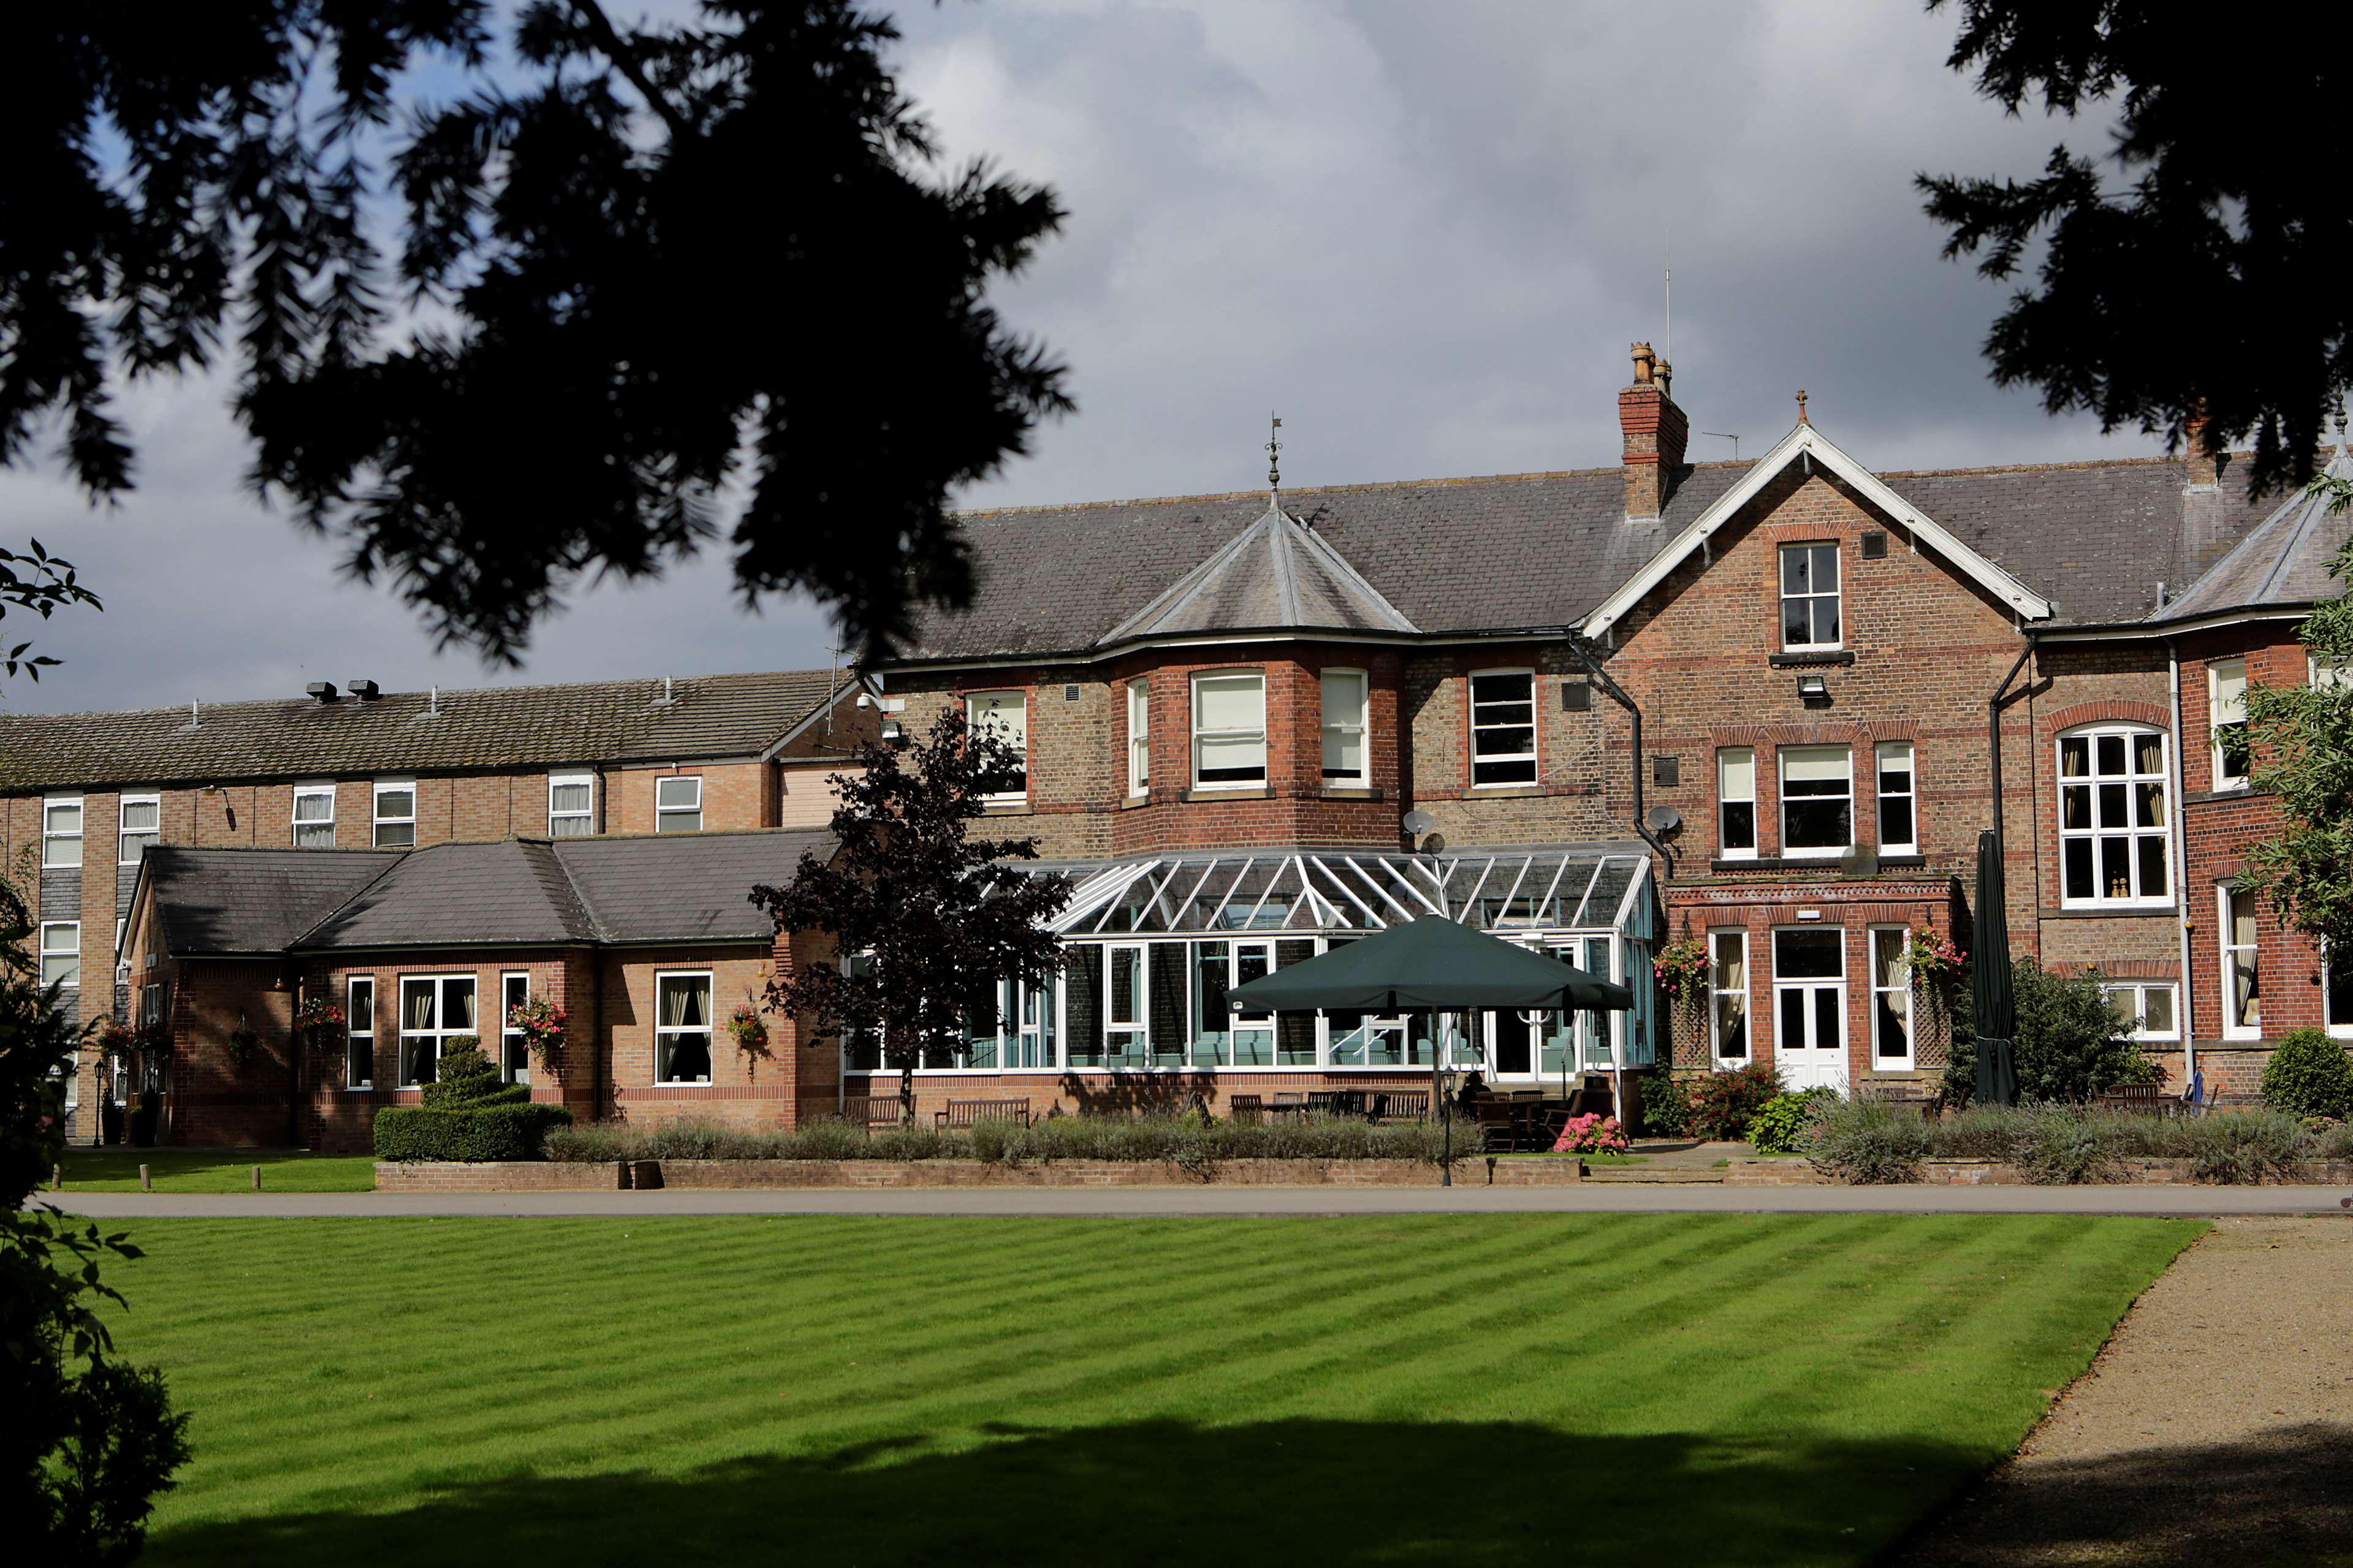 The Burn Hall Hotel York